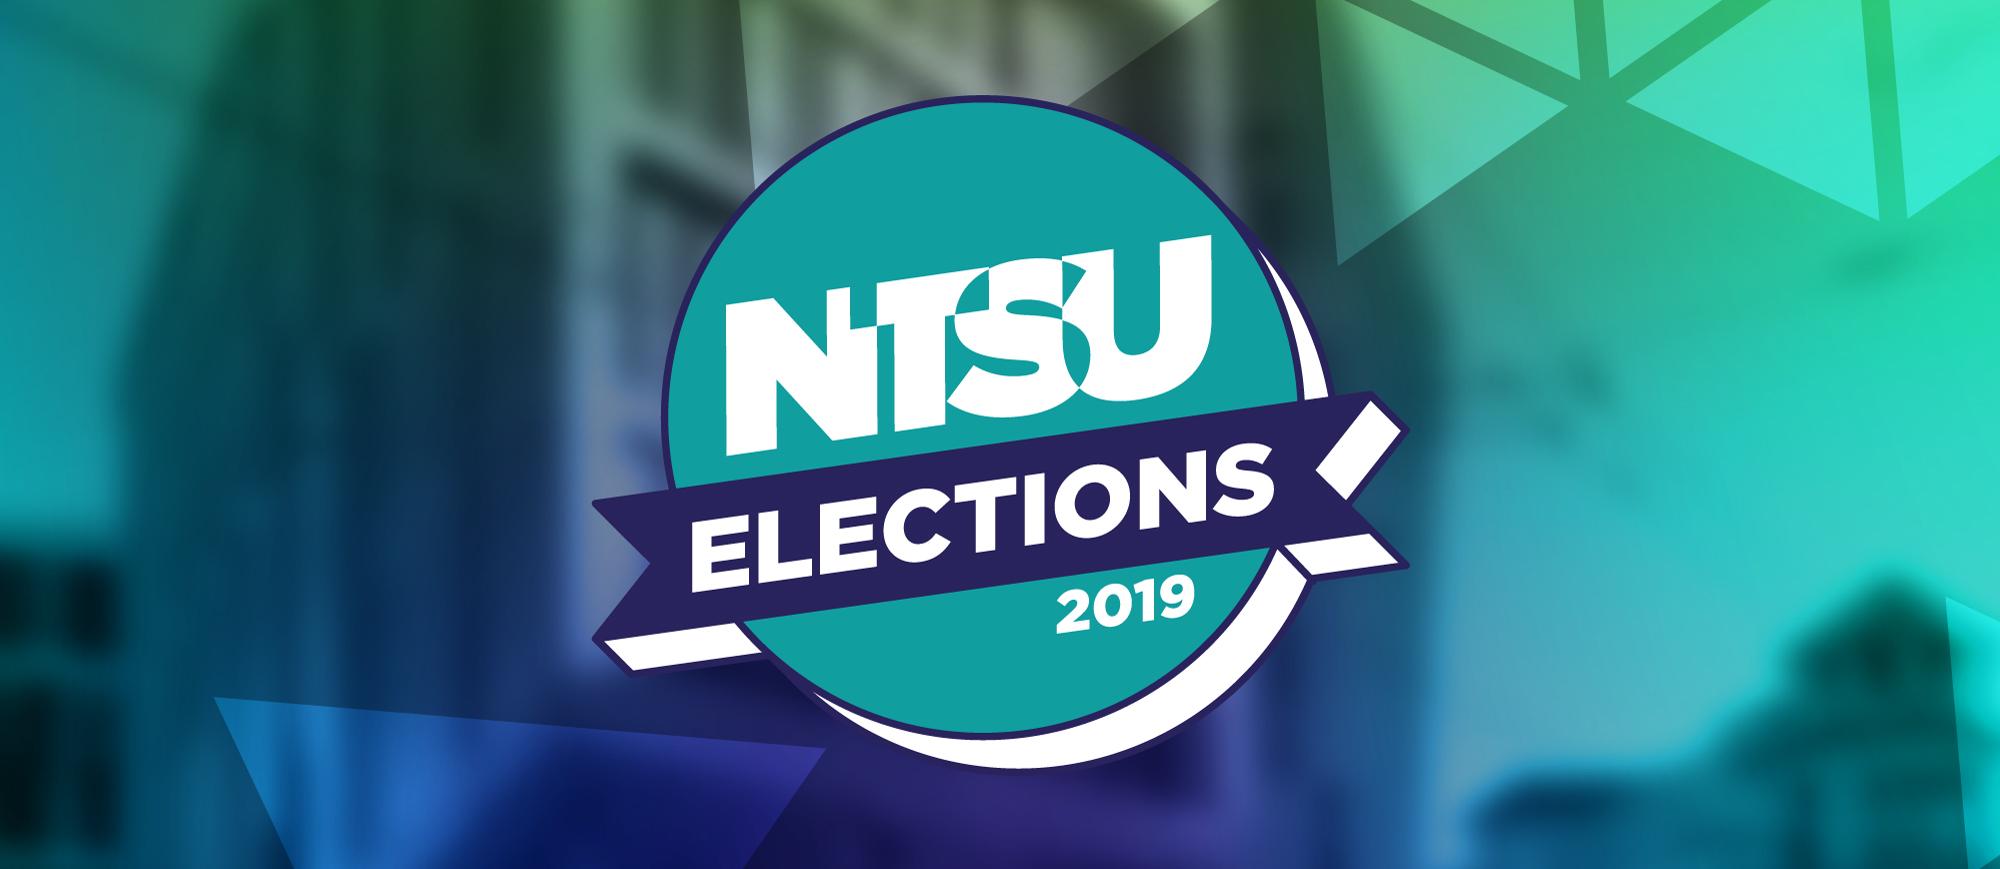 NTSU Elections 2019